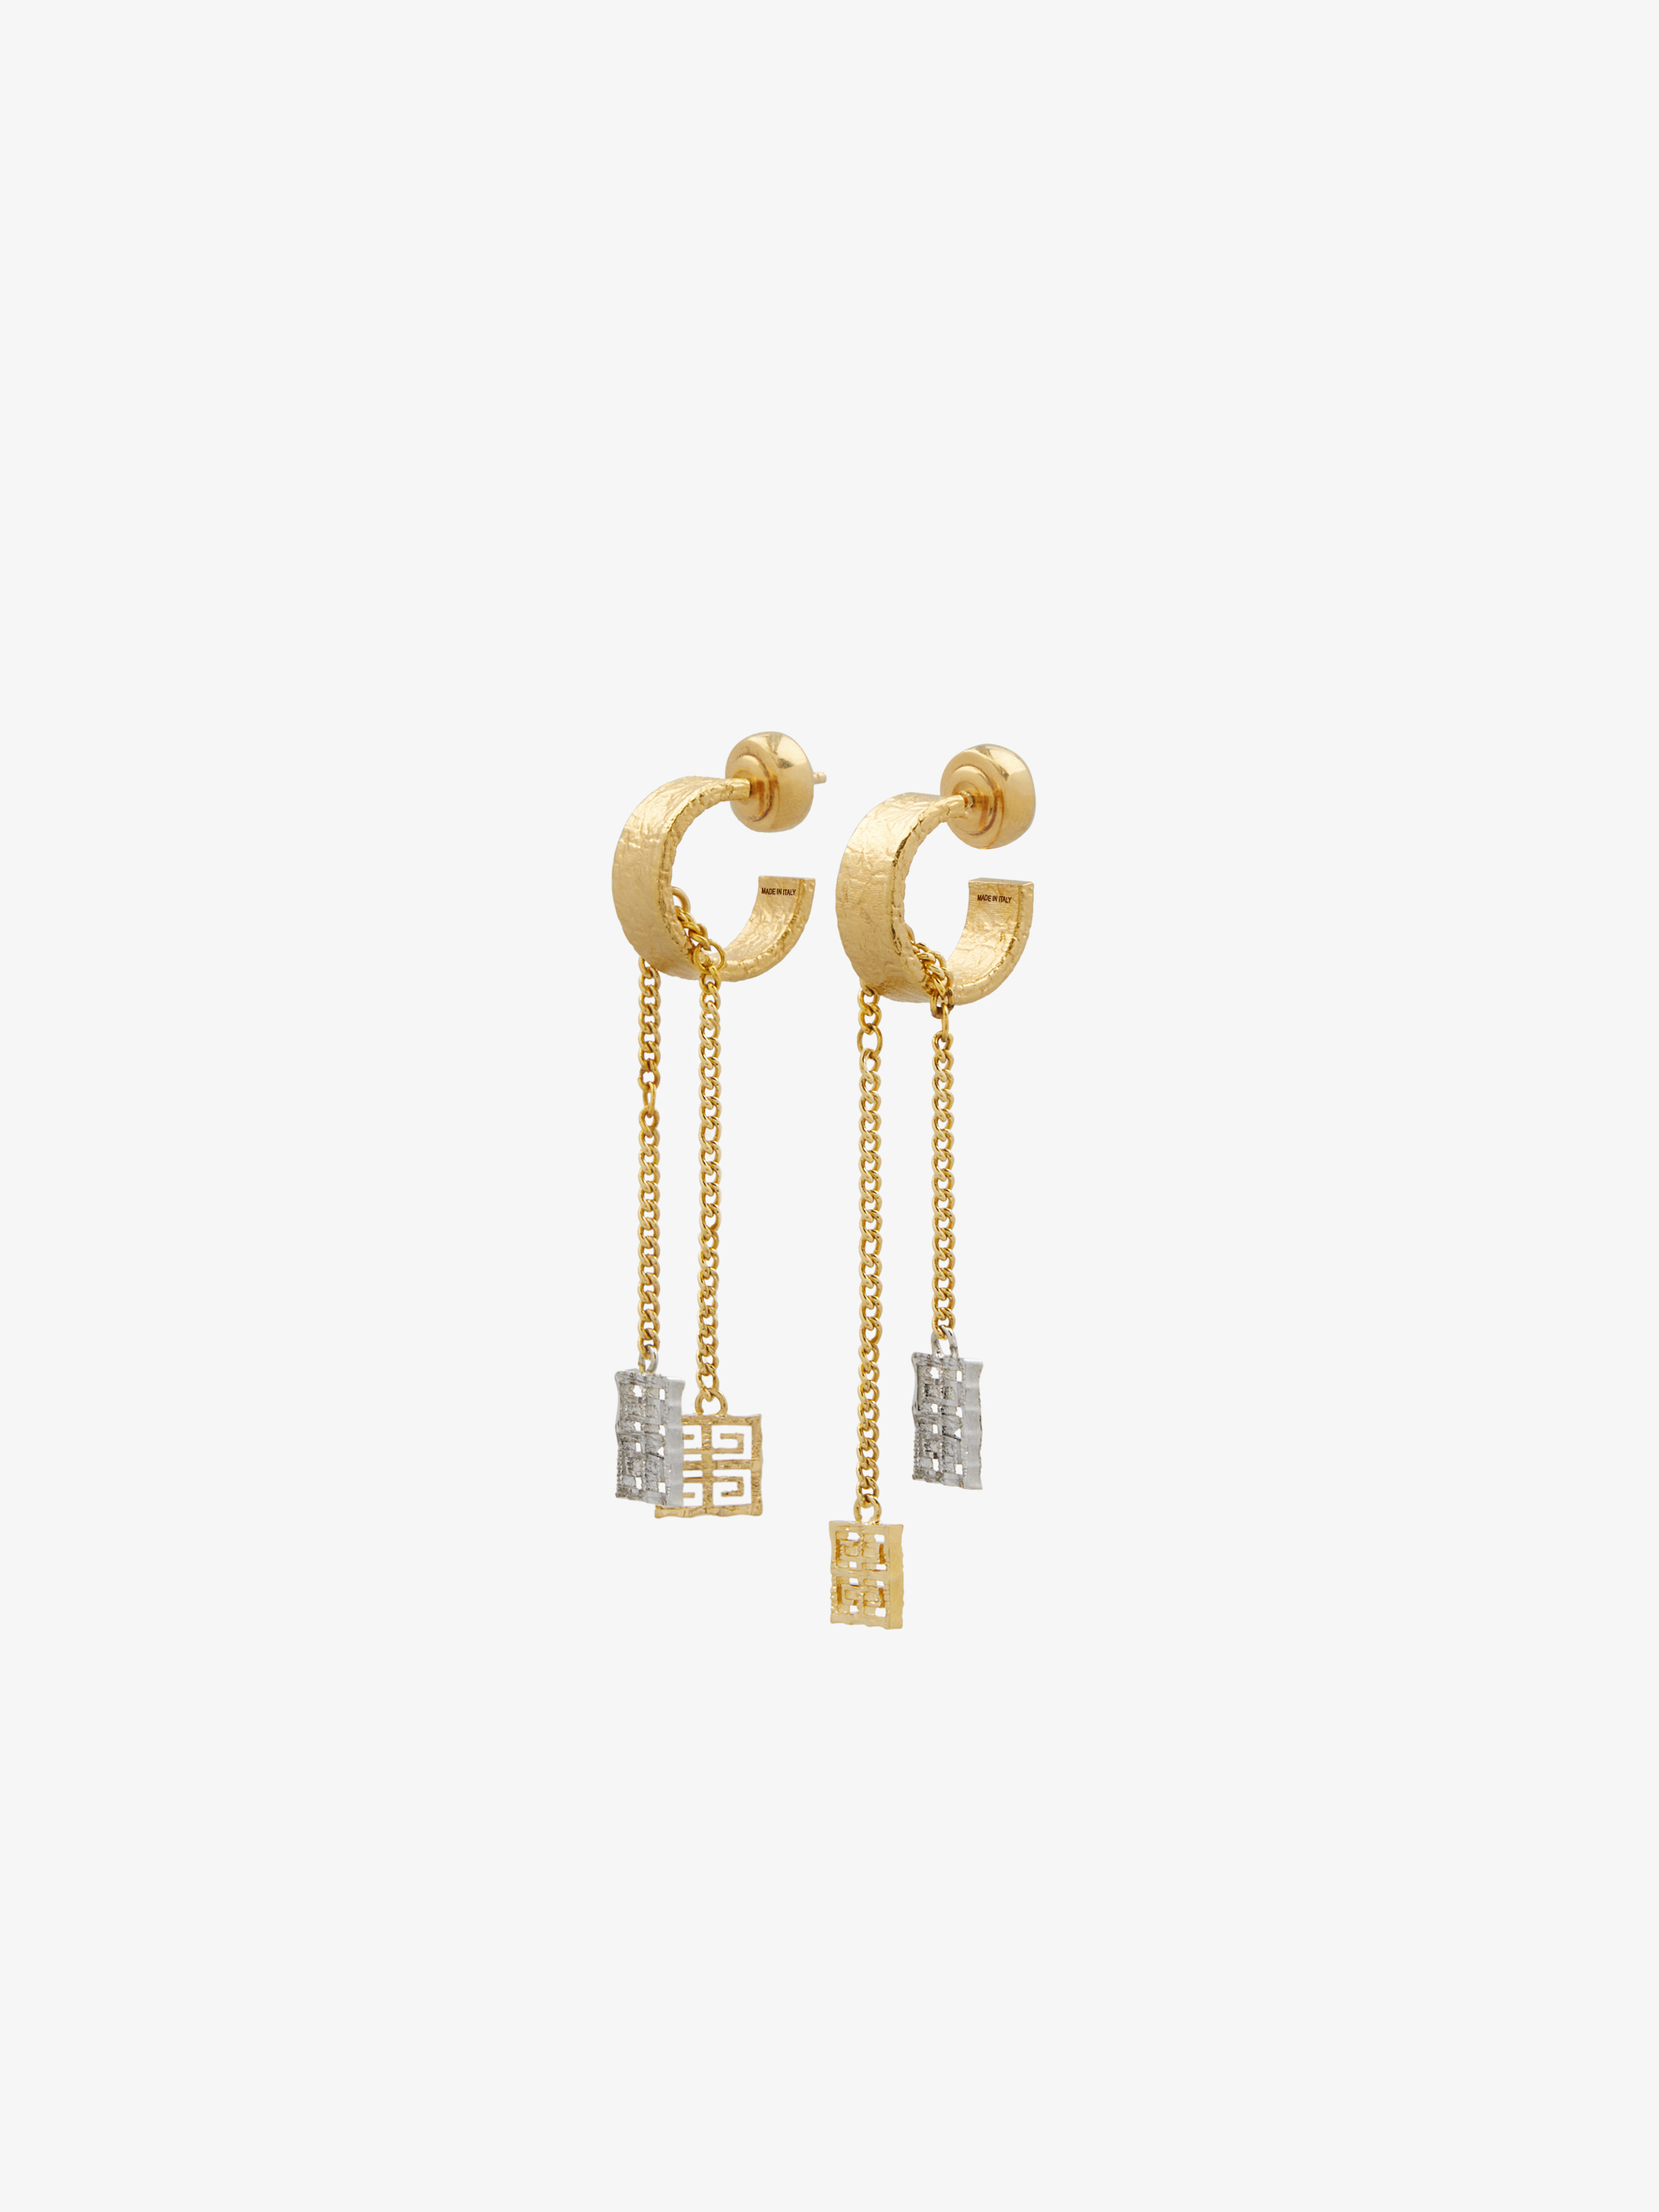 4G pendant earrings